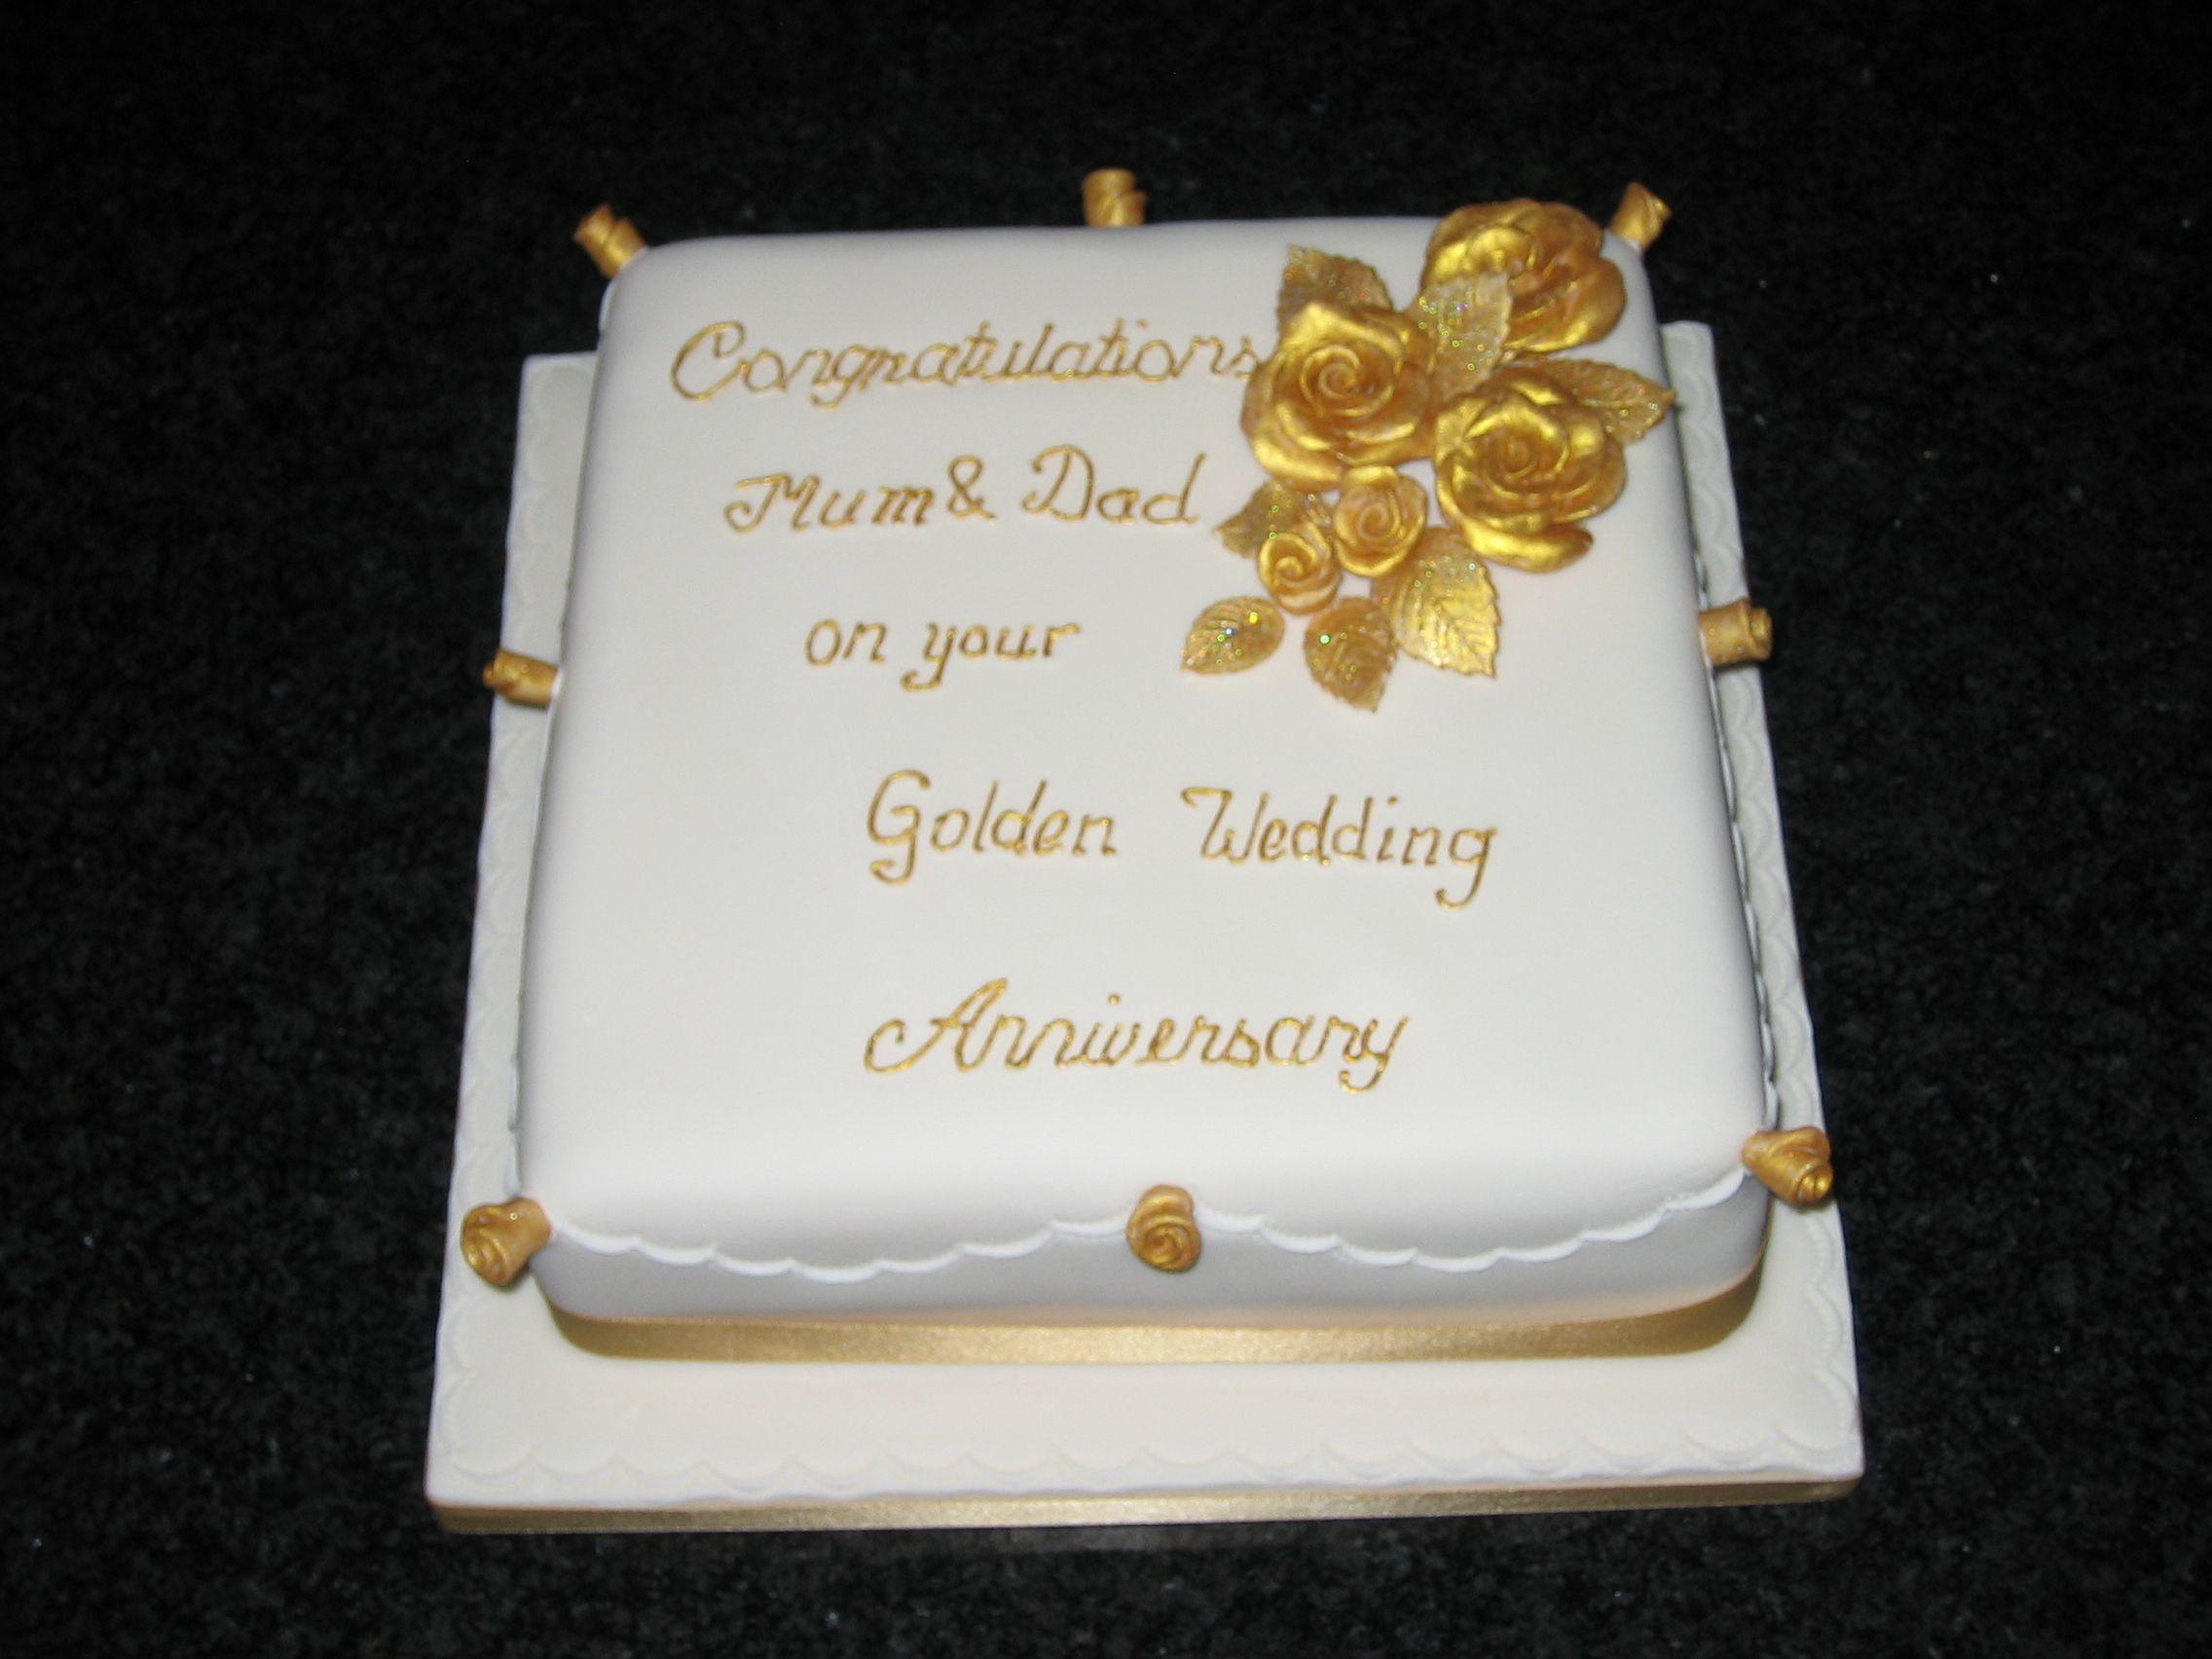 50th wedding decorations ideas  golden anniversary cakes and cupcakes  anniversary cakes gold heart